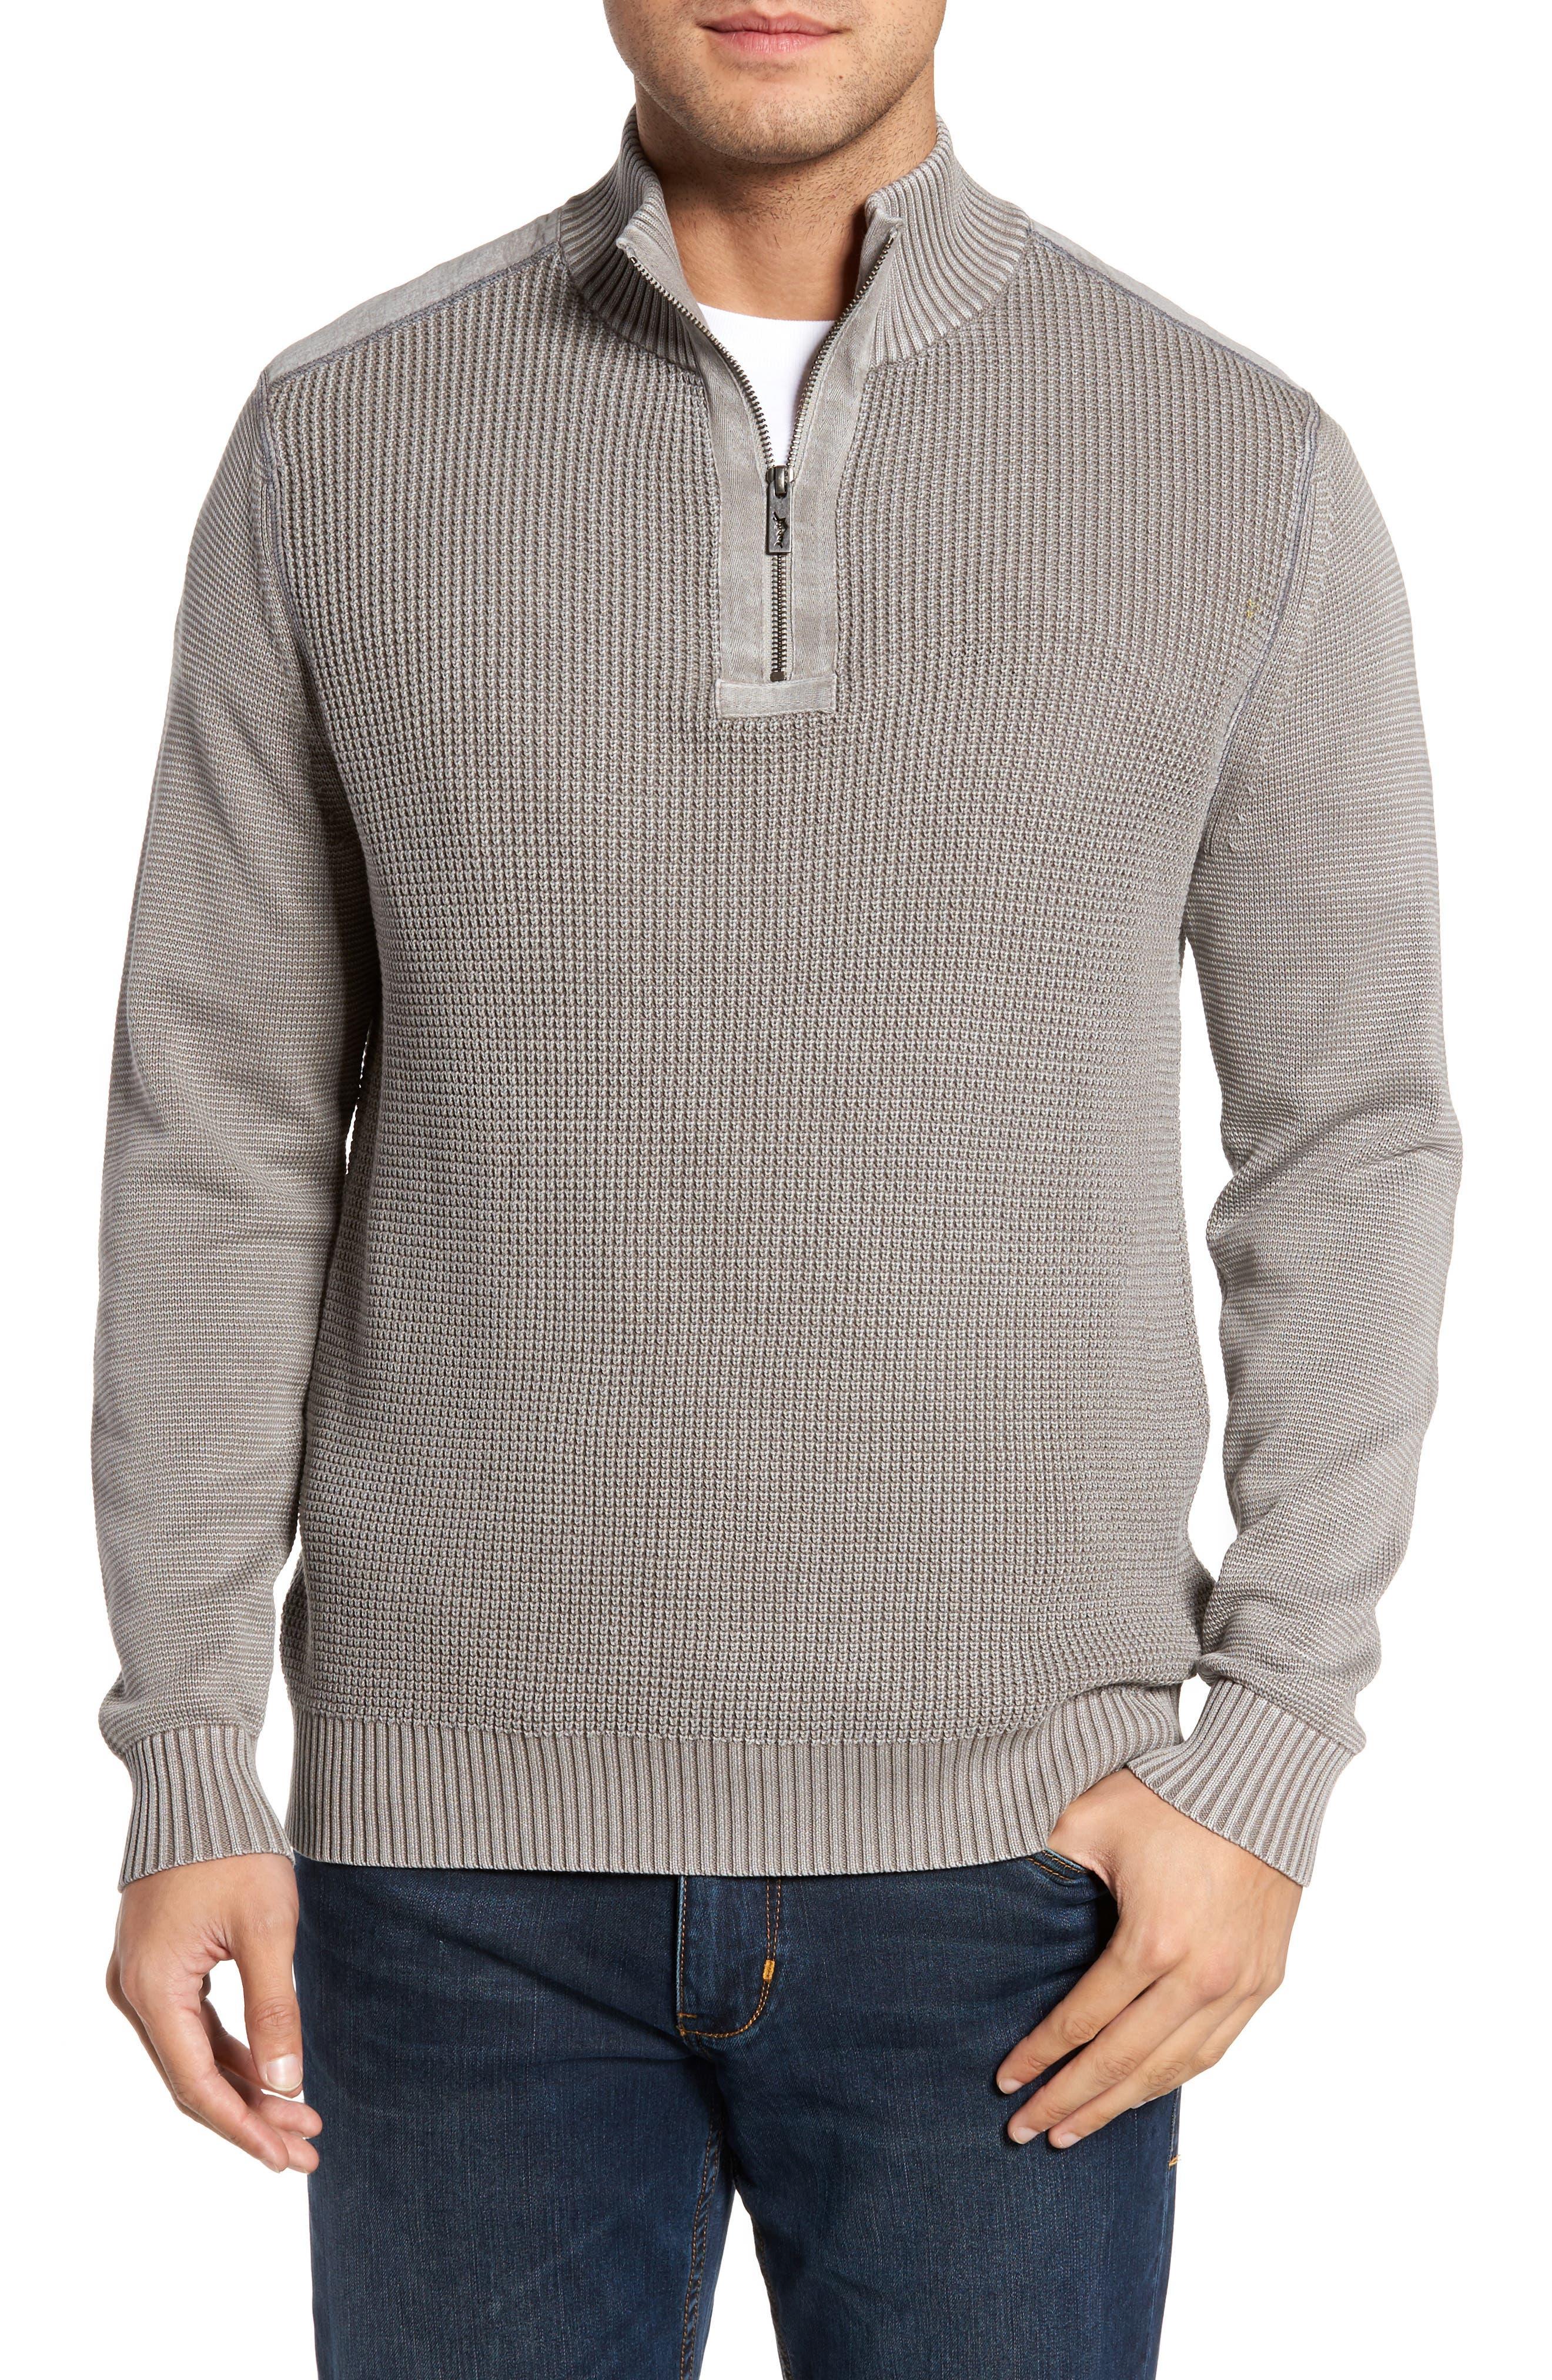 Coastal Shores Quarter Zip Sweater,                         Main,                         color, Pebble Grey